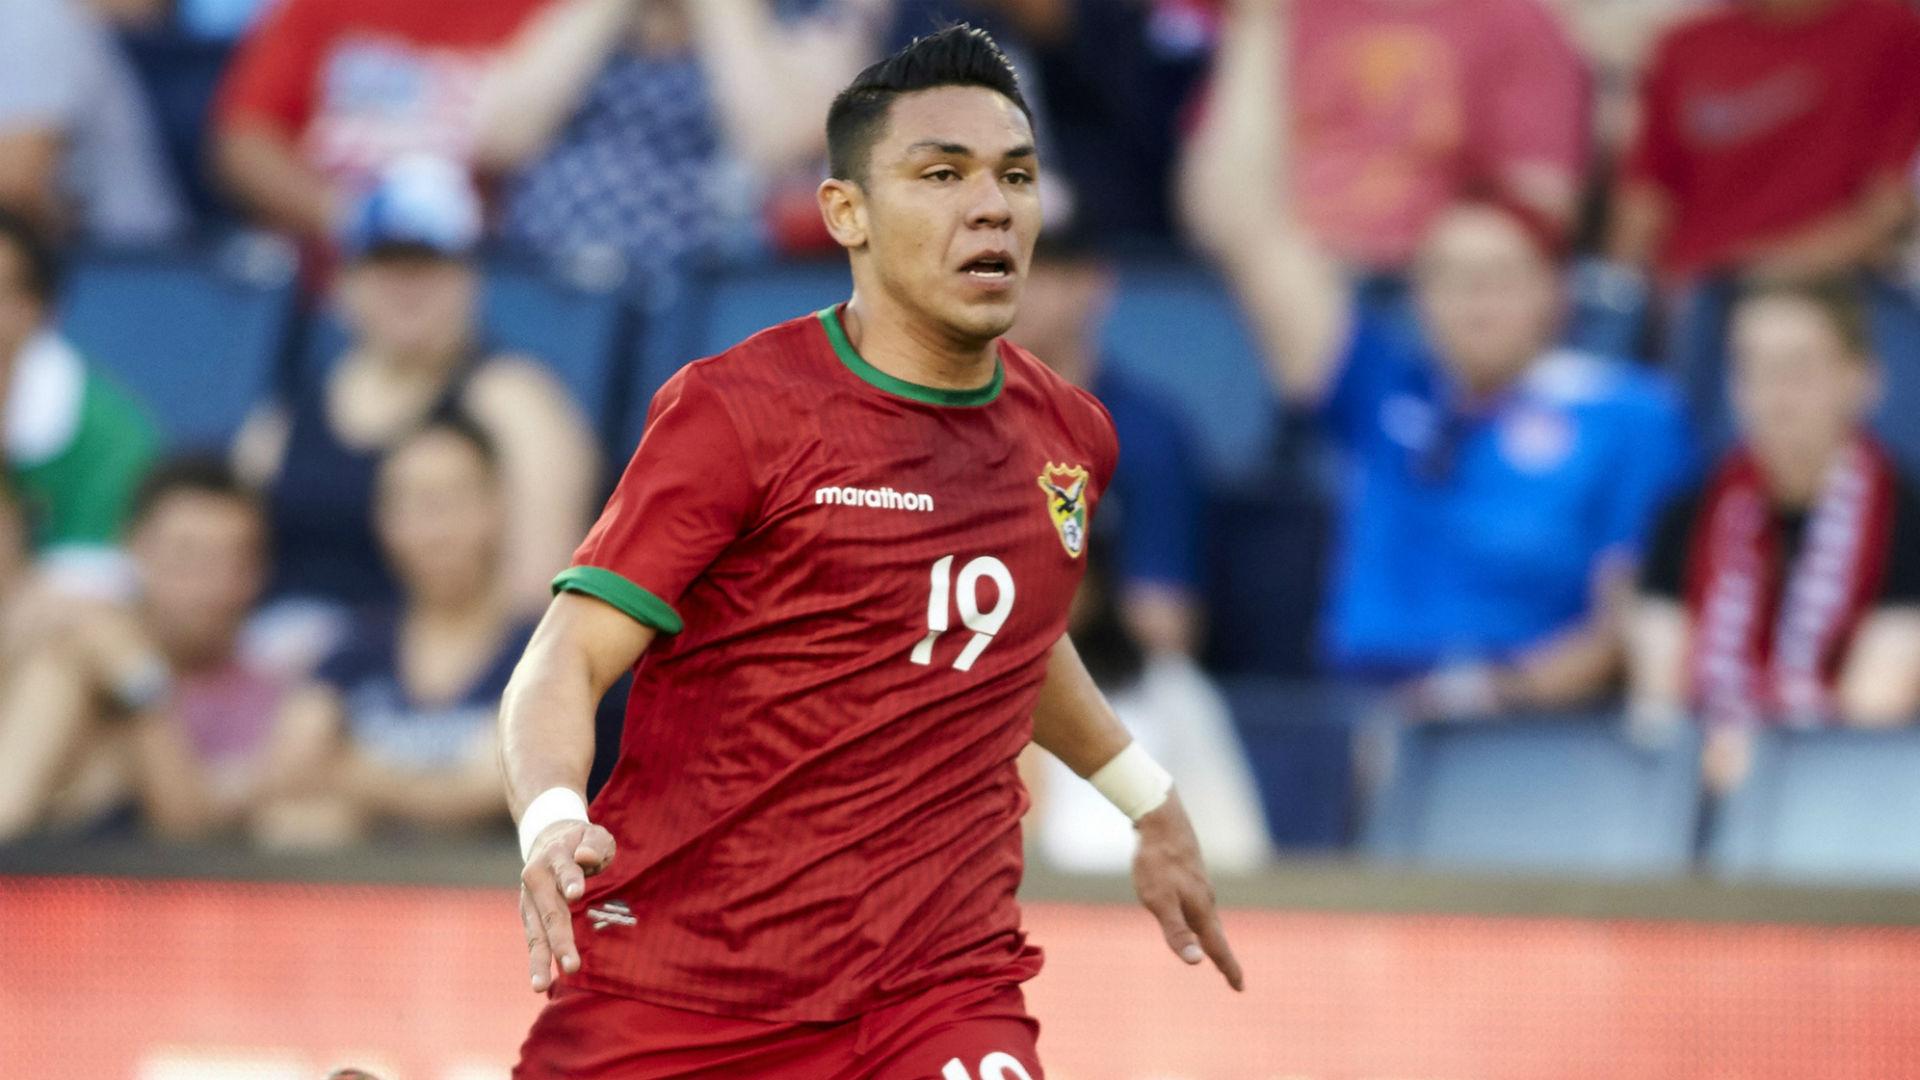 Carmelo Algaranaz Bolivia 052816.jpg